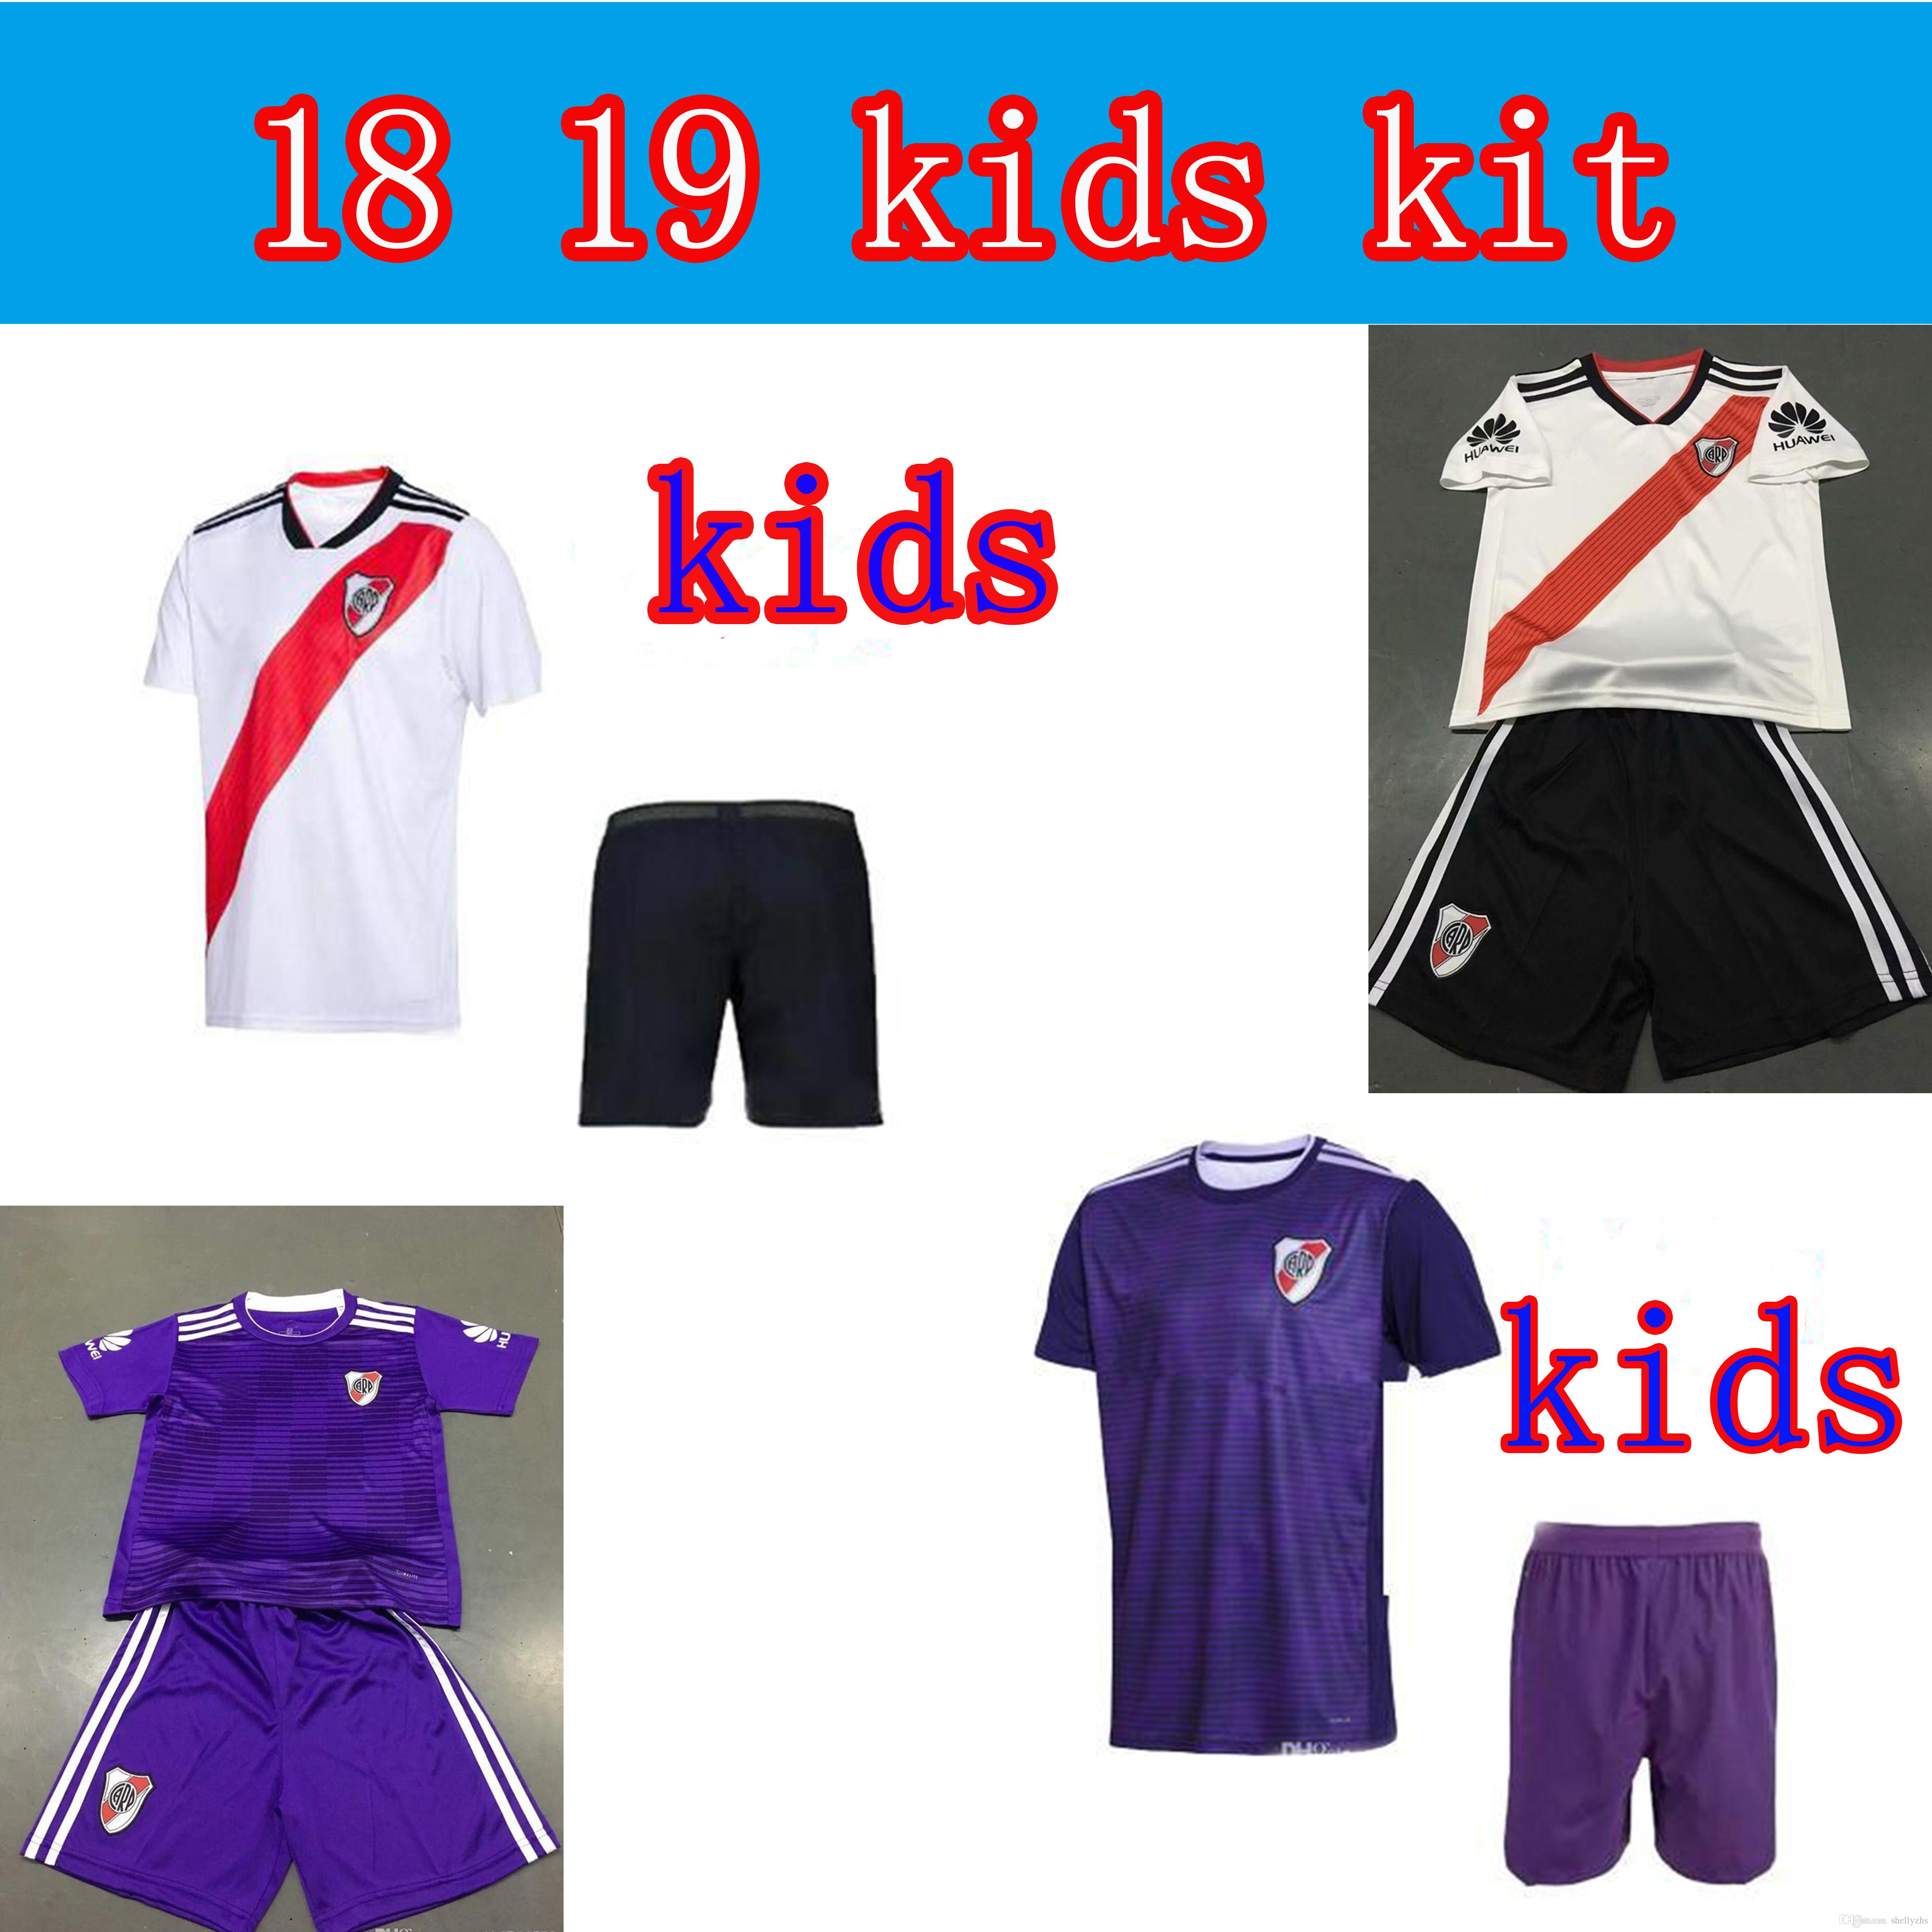 3aaf0152933c1 Camiseta De Fútbol Infantil 2018 River Plate Infantil 18 19 River Plate  SCOCCO CASCO 18 19 G. MARTINEZ PONZIO MARTINEZ PEREZ En Casa Camiseta De  Fútbol ...